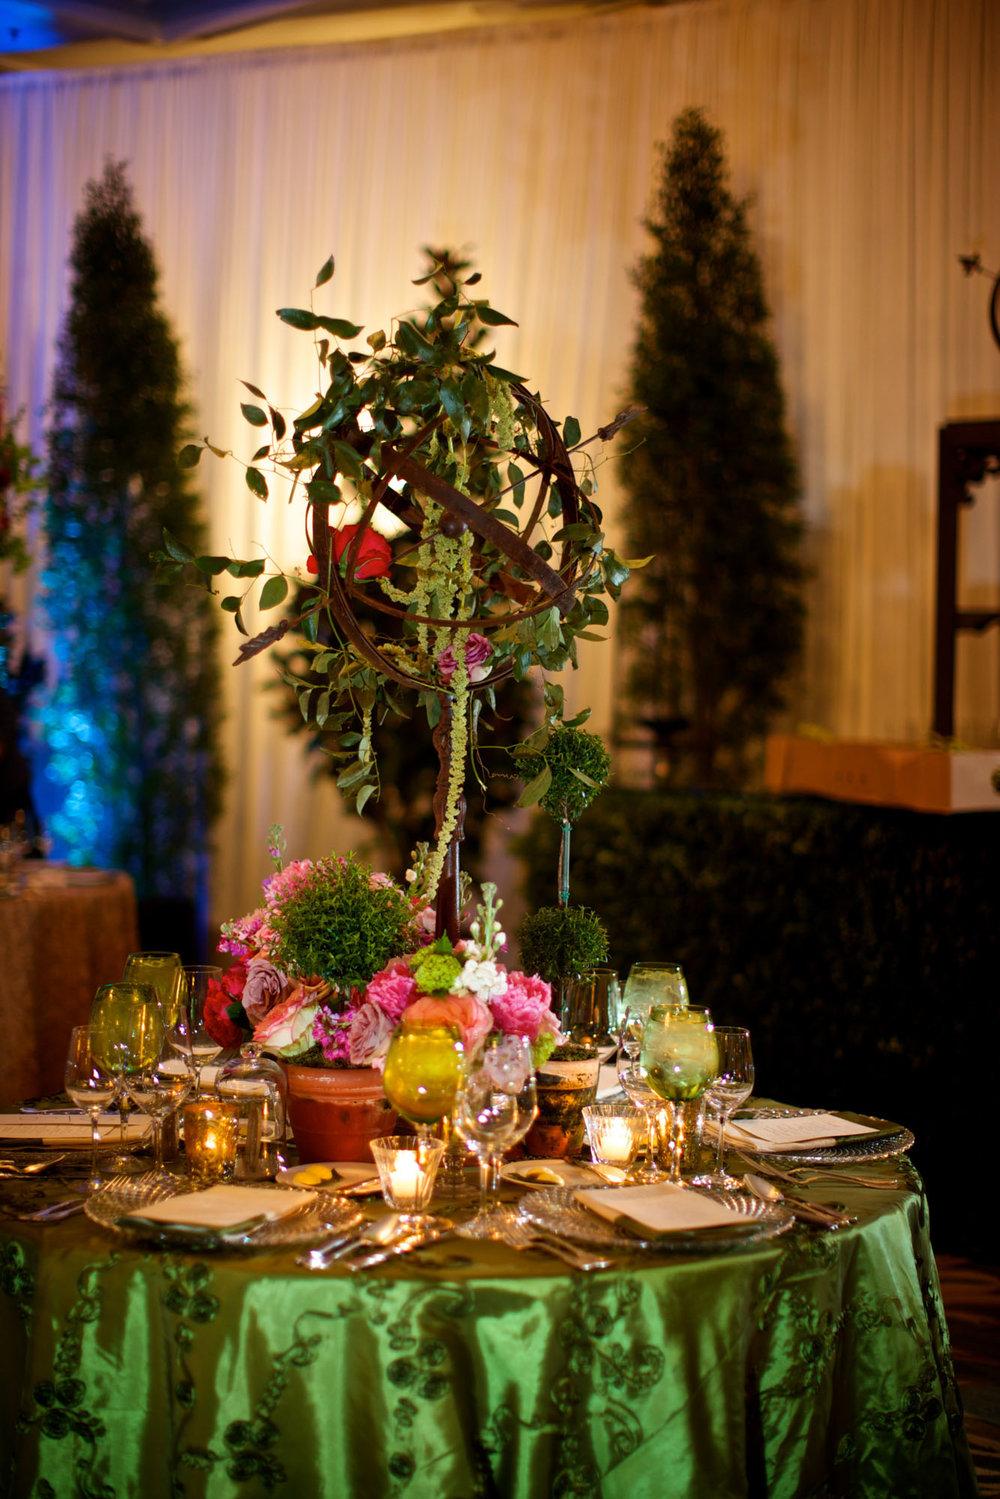 birch-bespoke-events-and-weddings-4.jpg